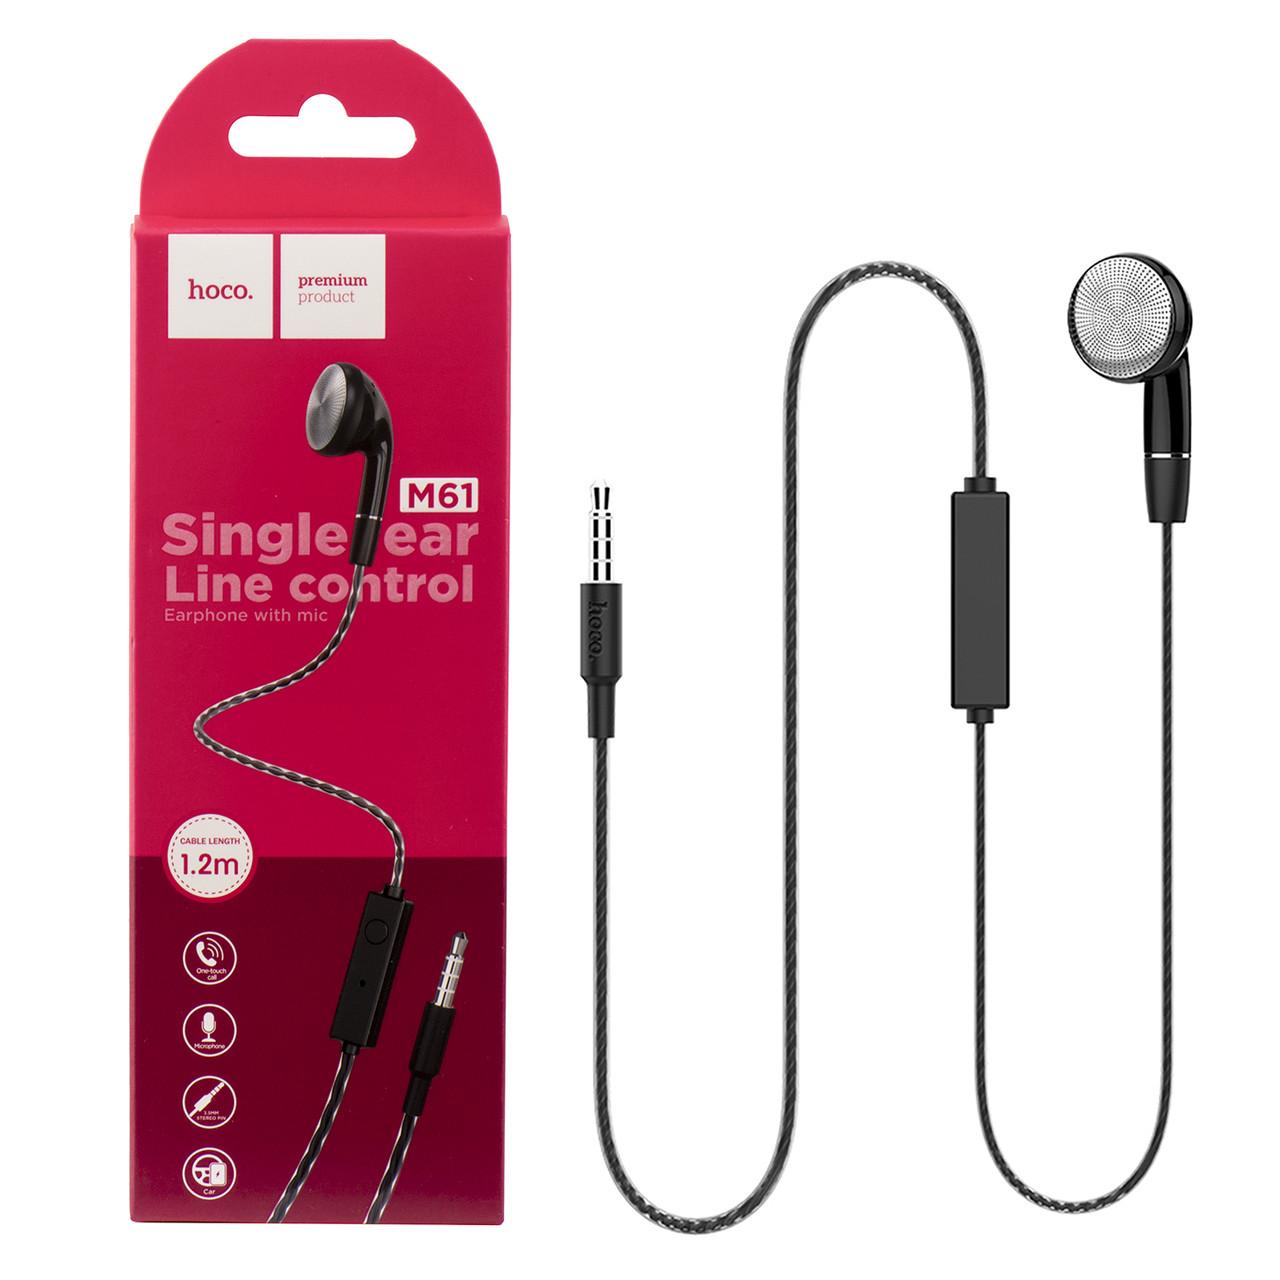 Гарнитура Hoco M61 Single Ear Line Control, Black